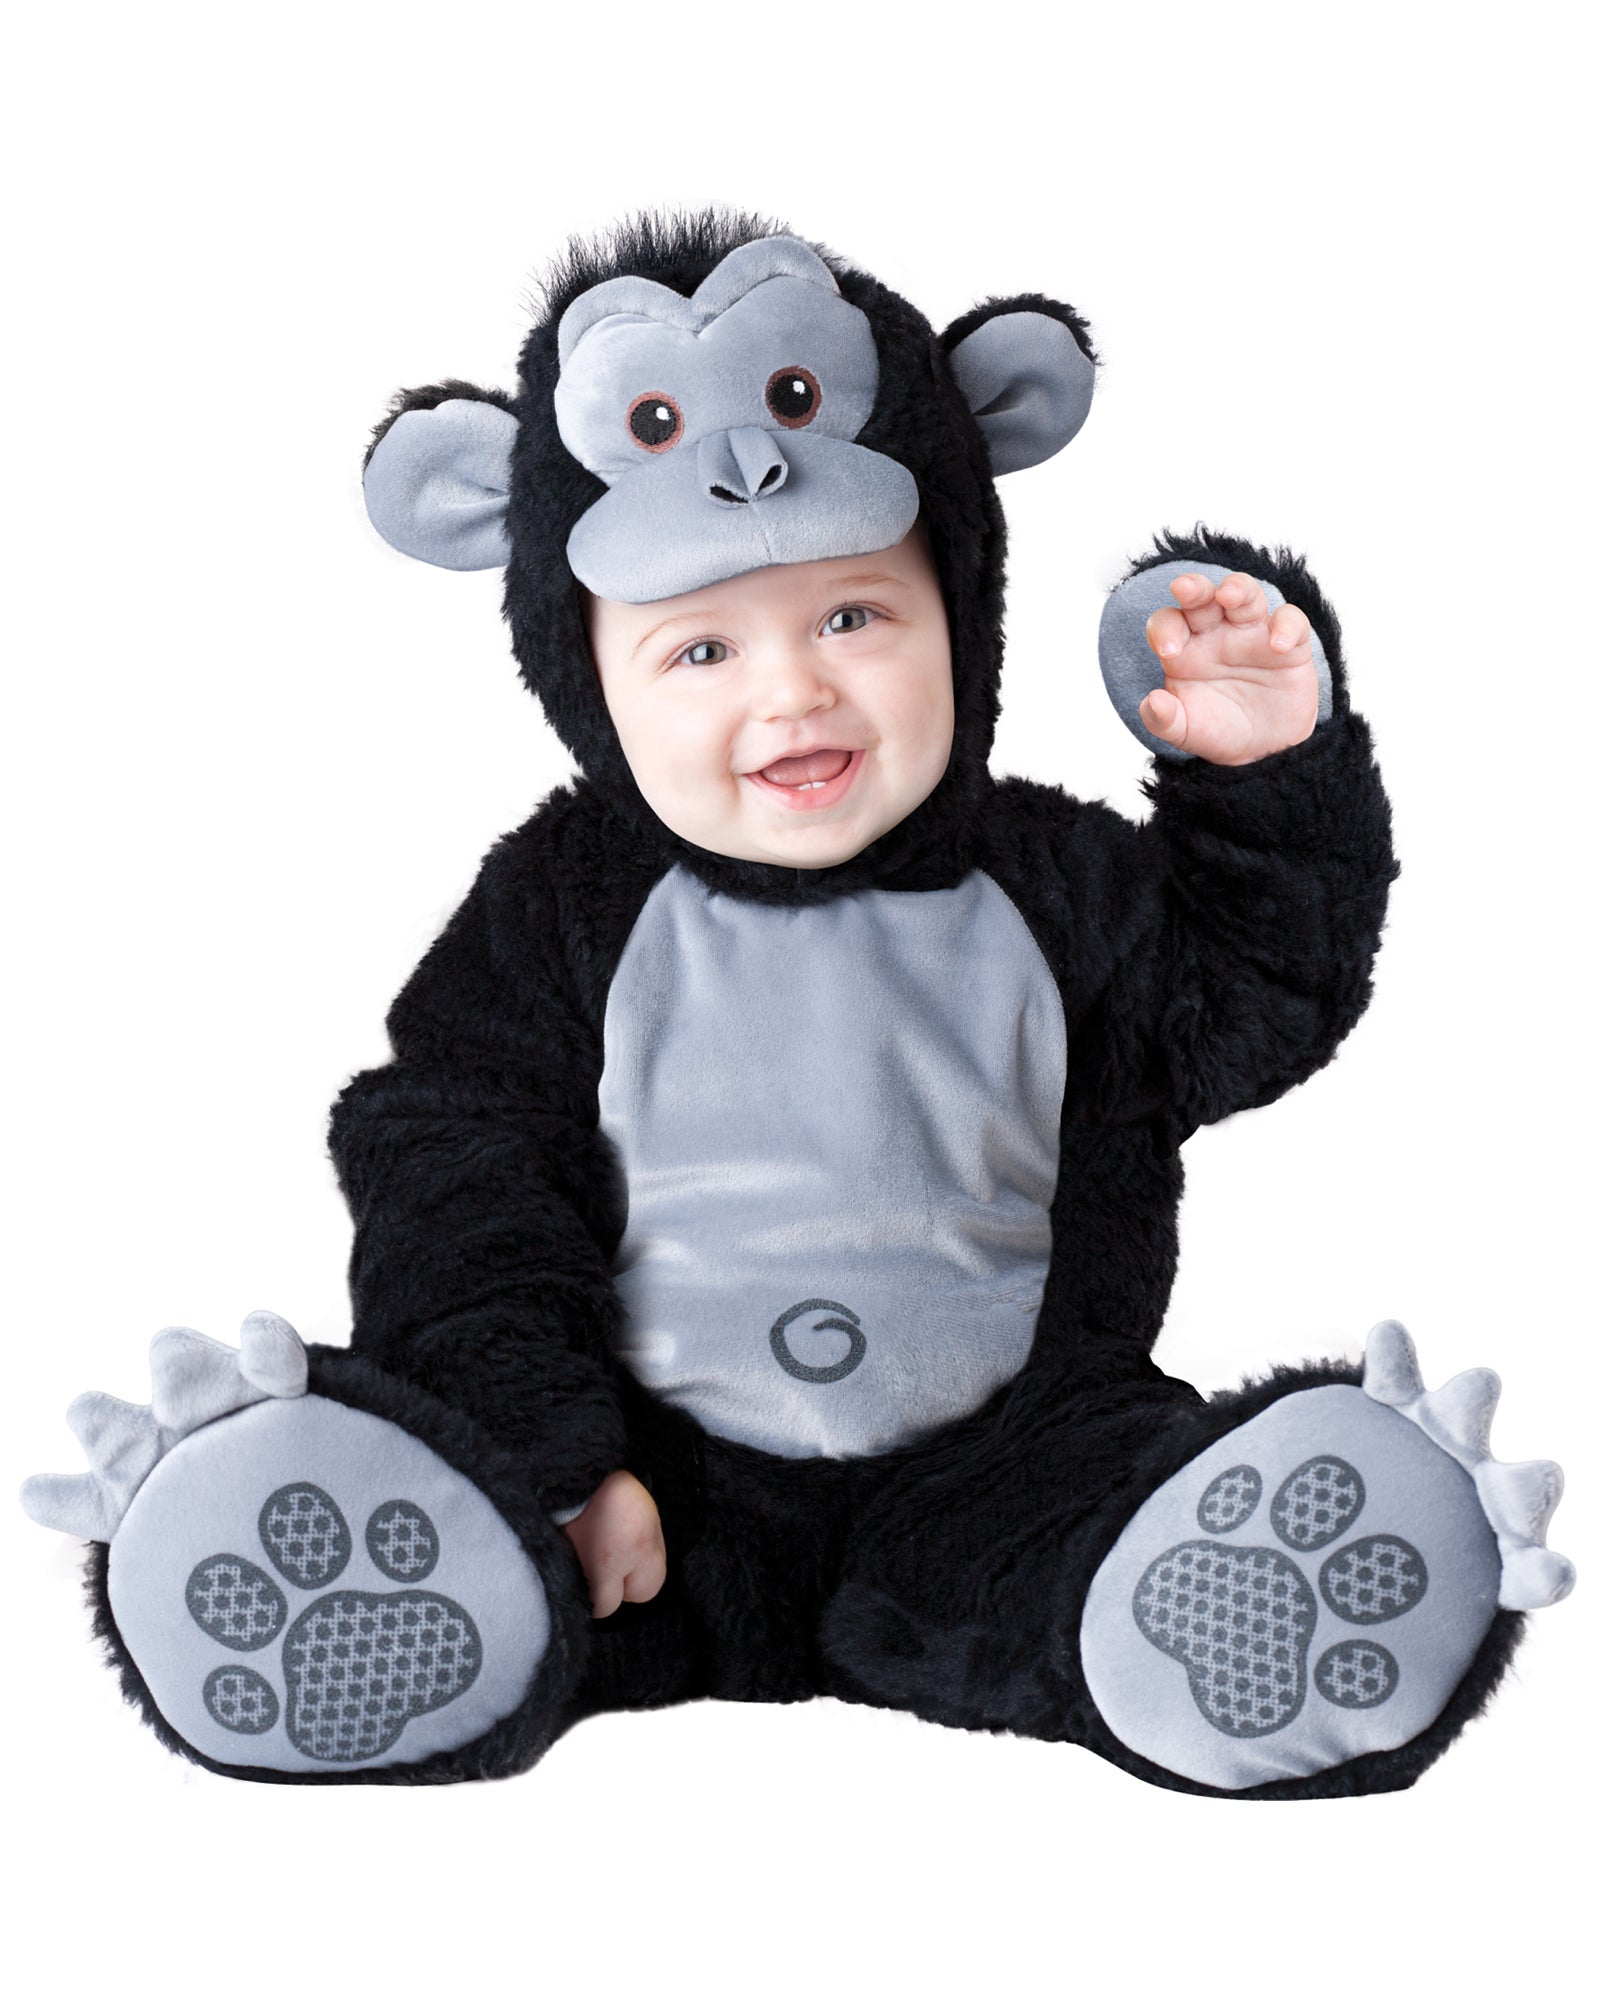 Hobbypos Goofy Gorilla Monkey Ape Animal Deluxe Toddler Boys Costume